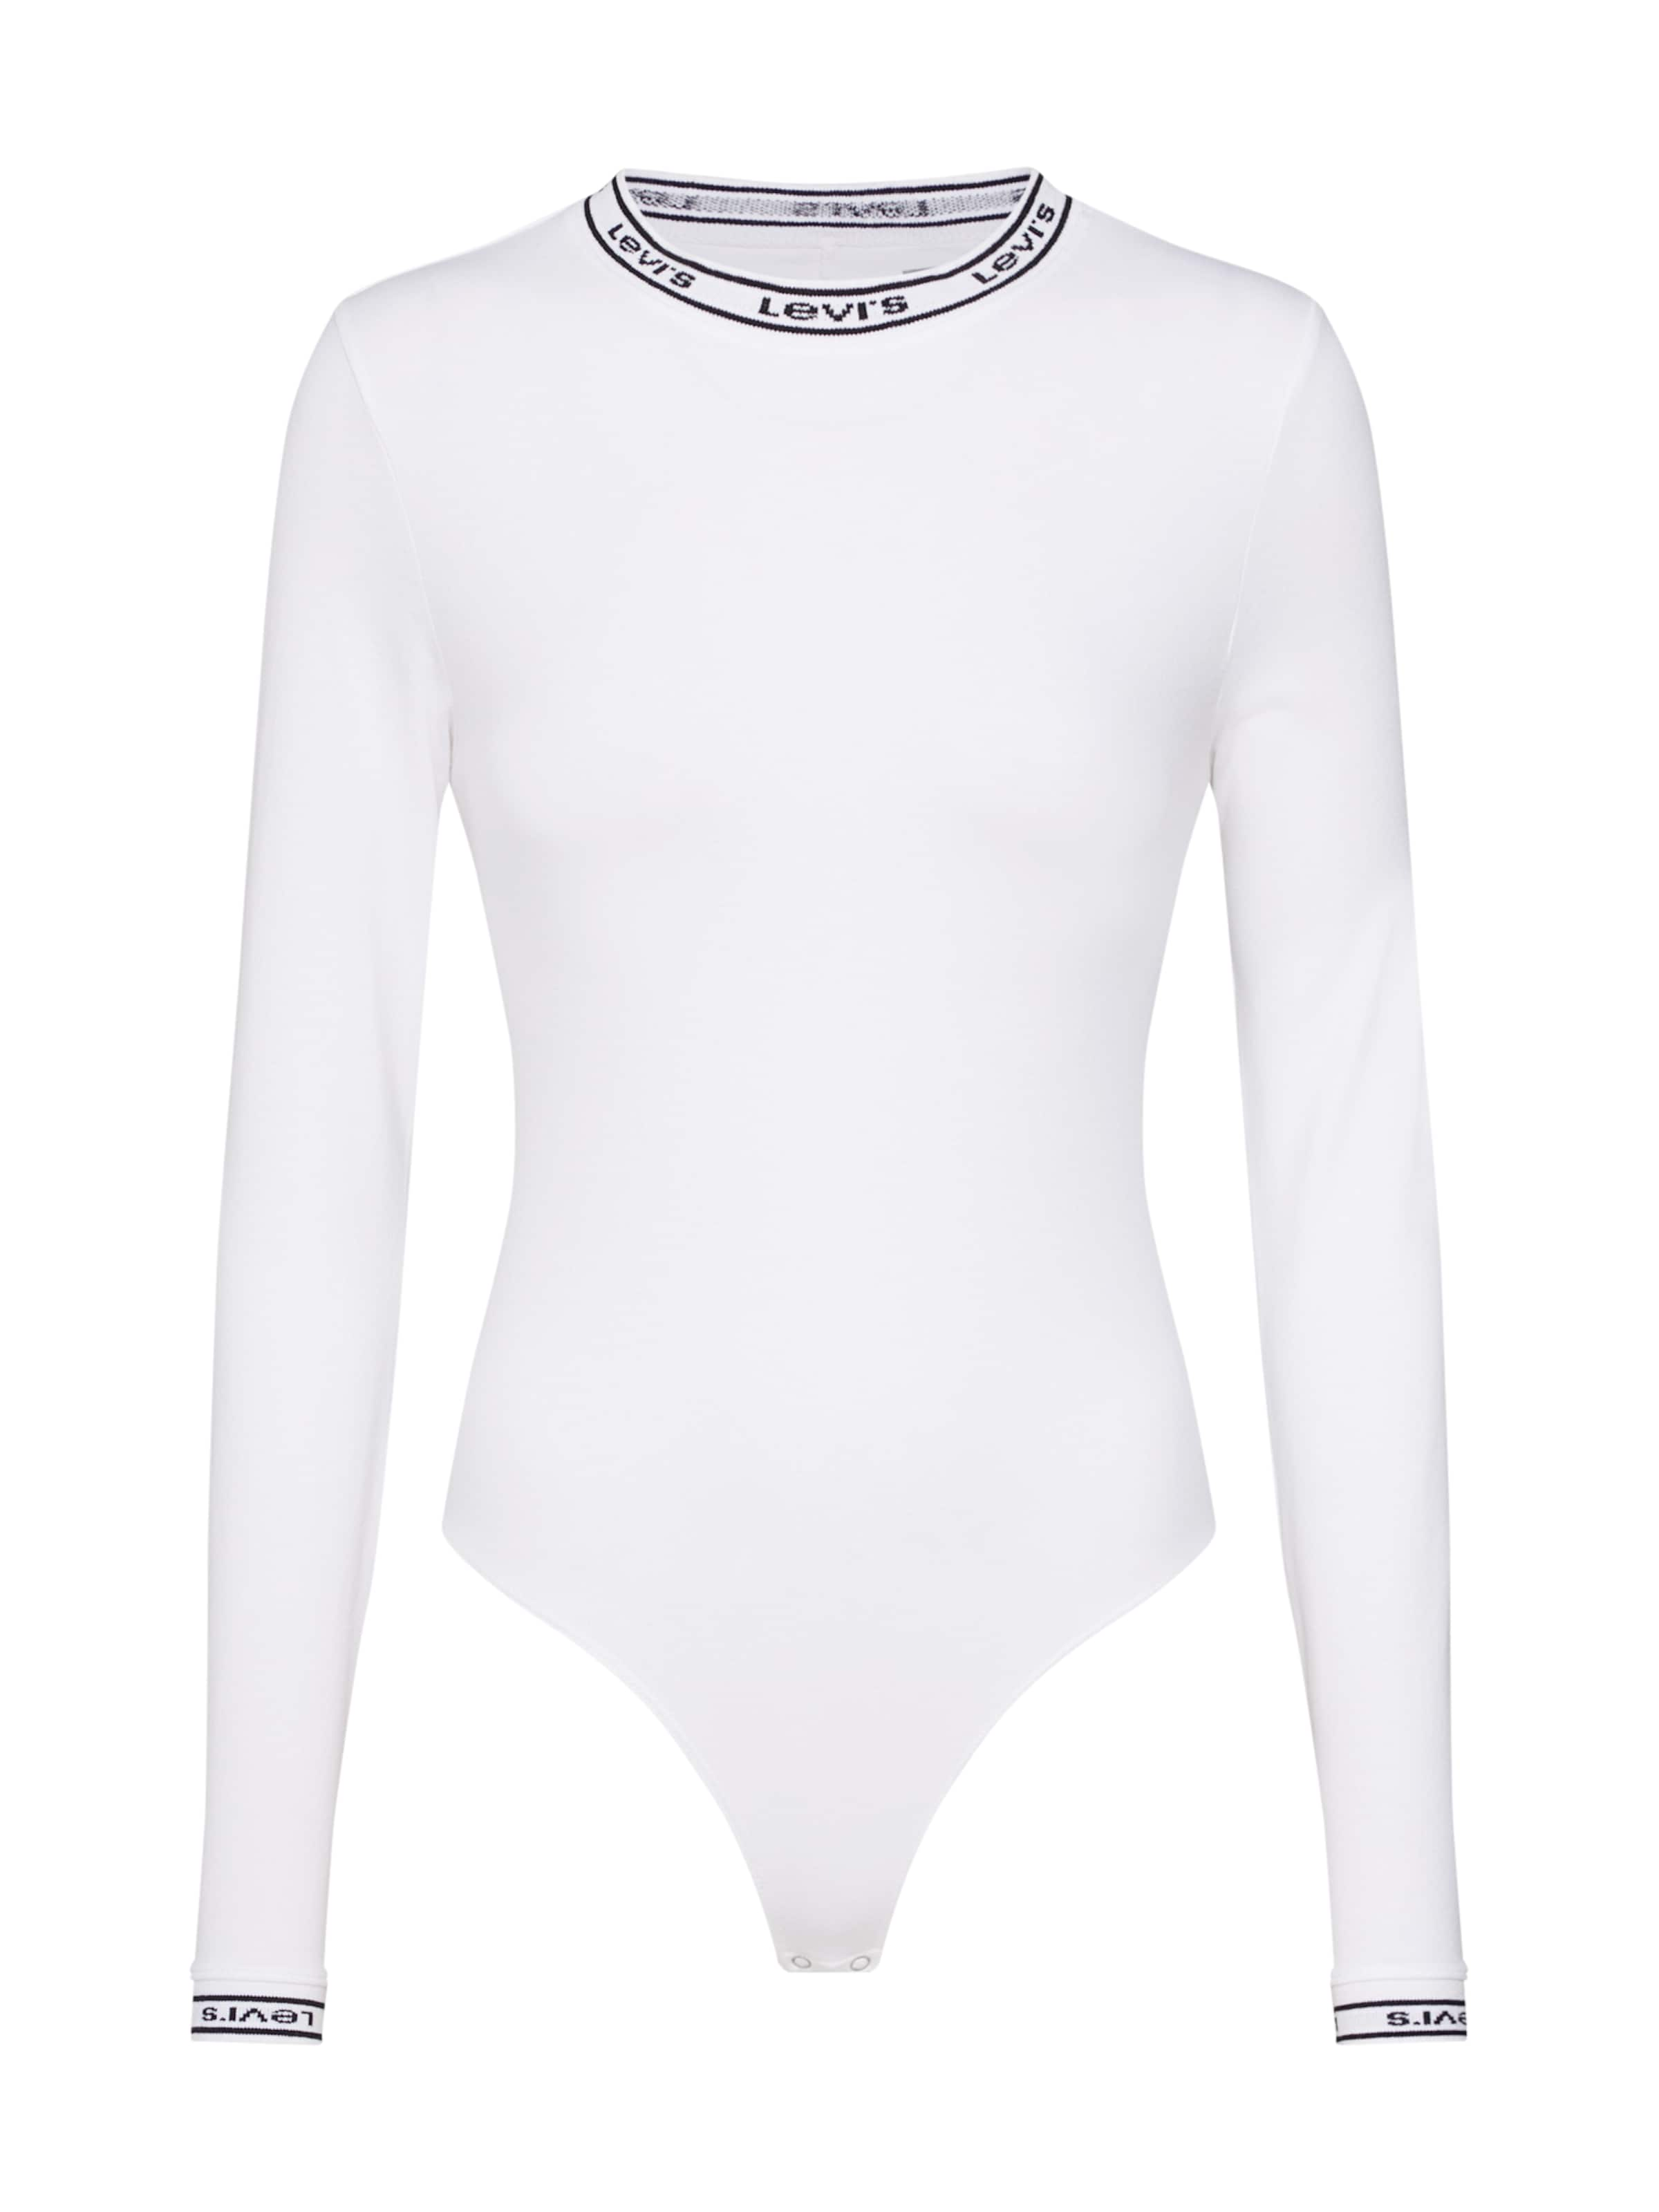 Levi's In Shirt 'ls Bodysuit' Weiß thQrsdC